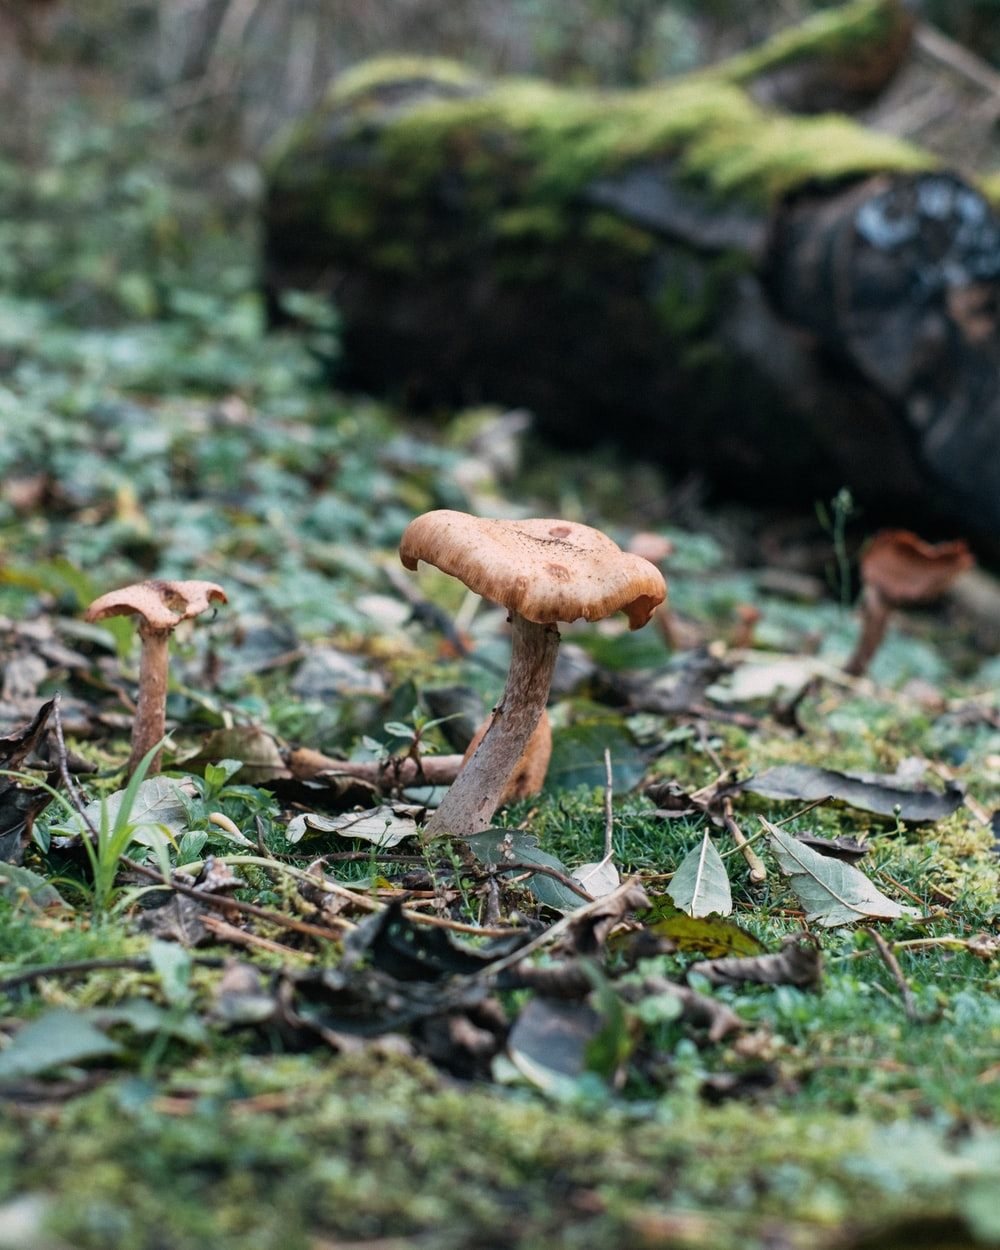 brown and white mushroom